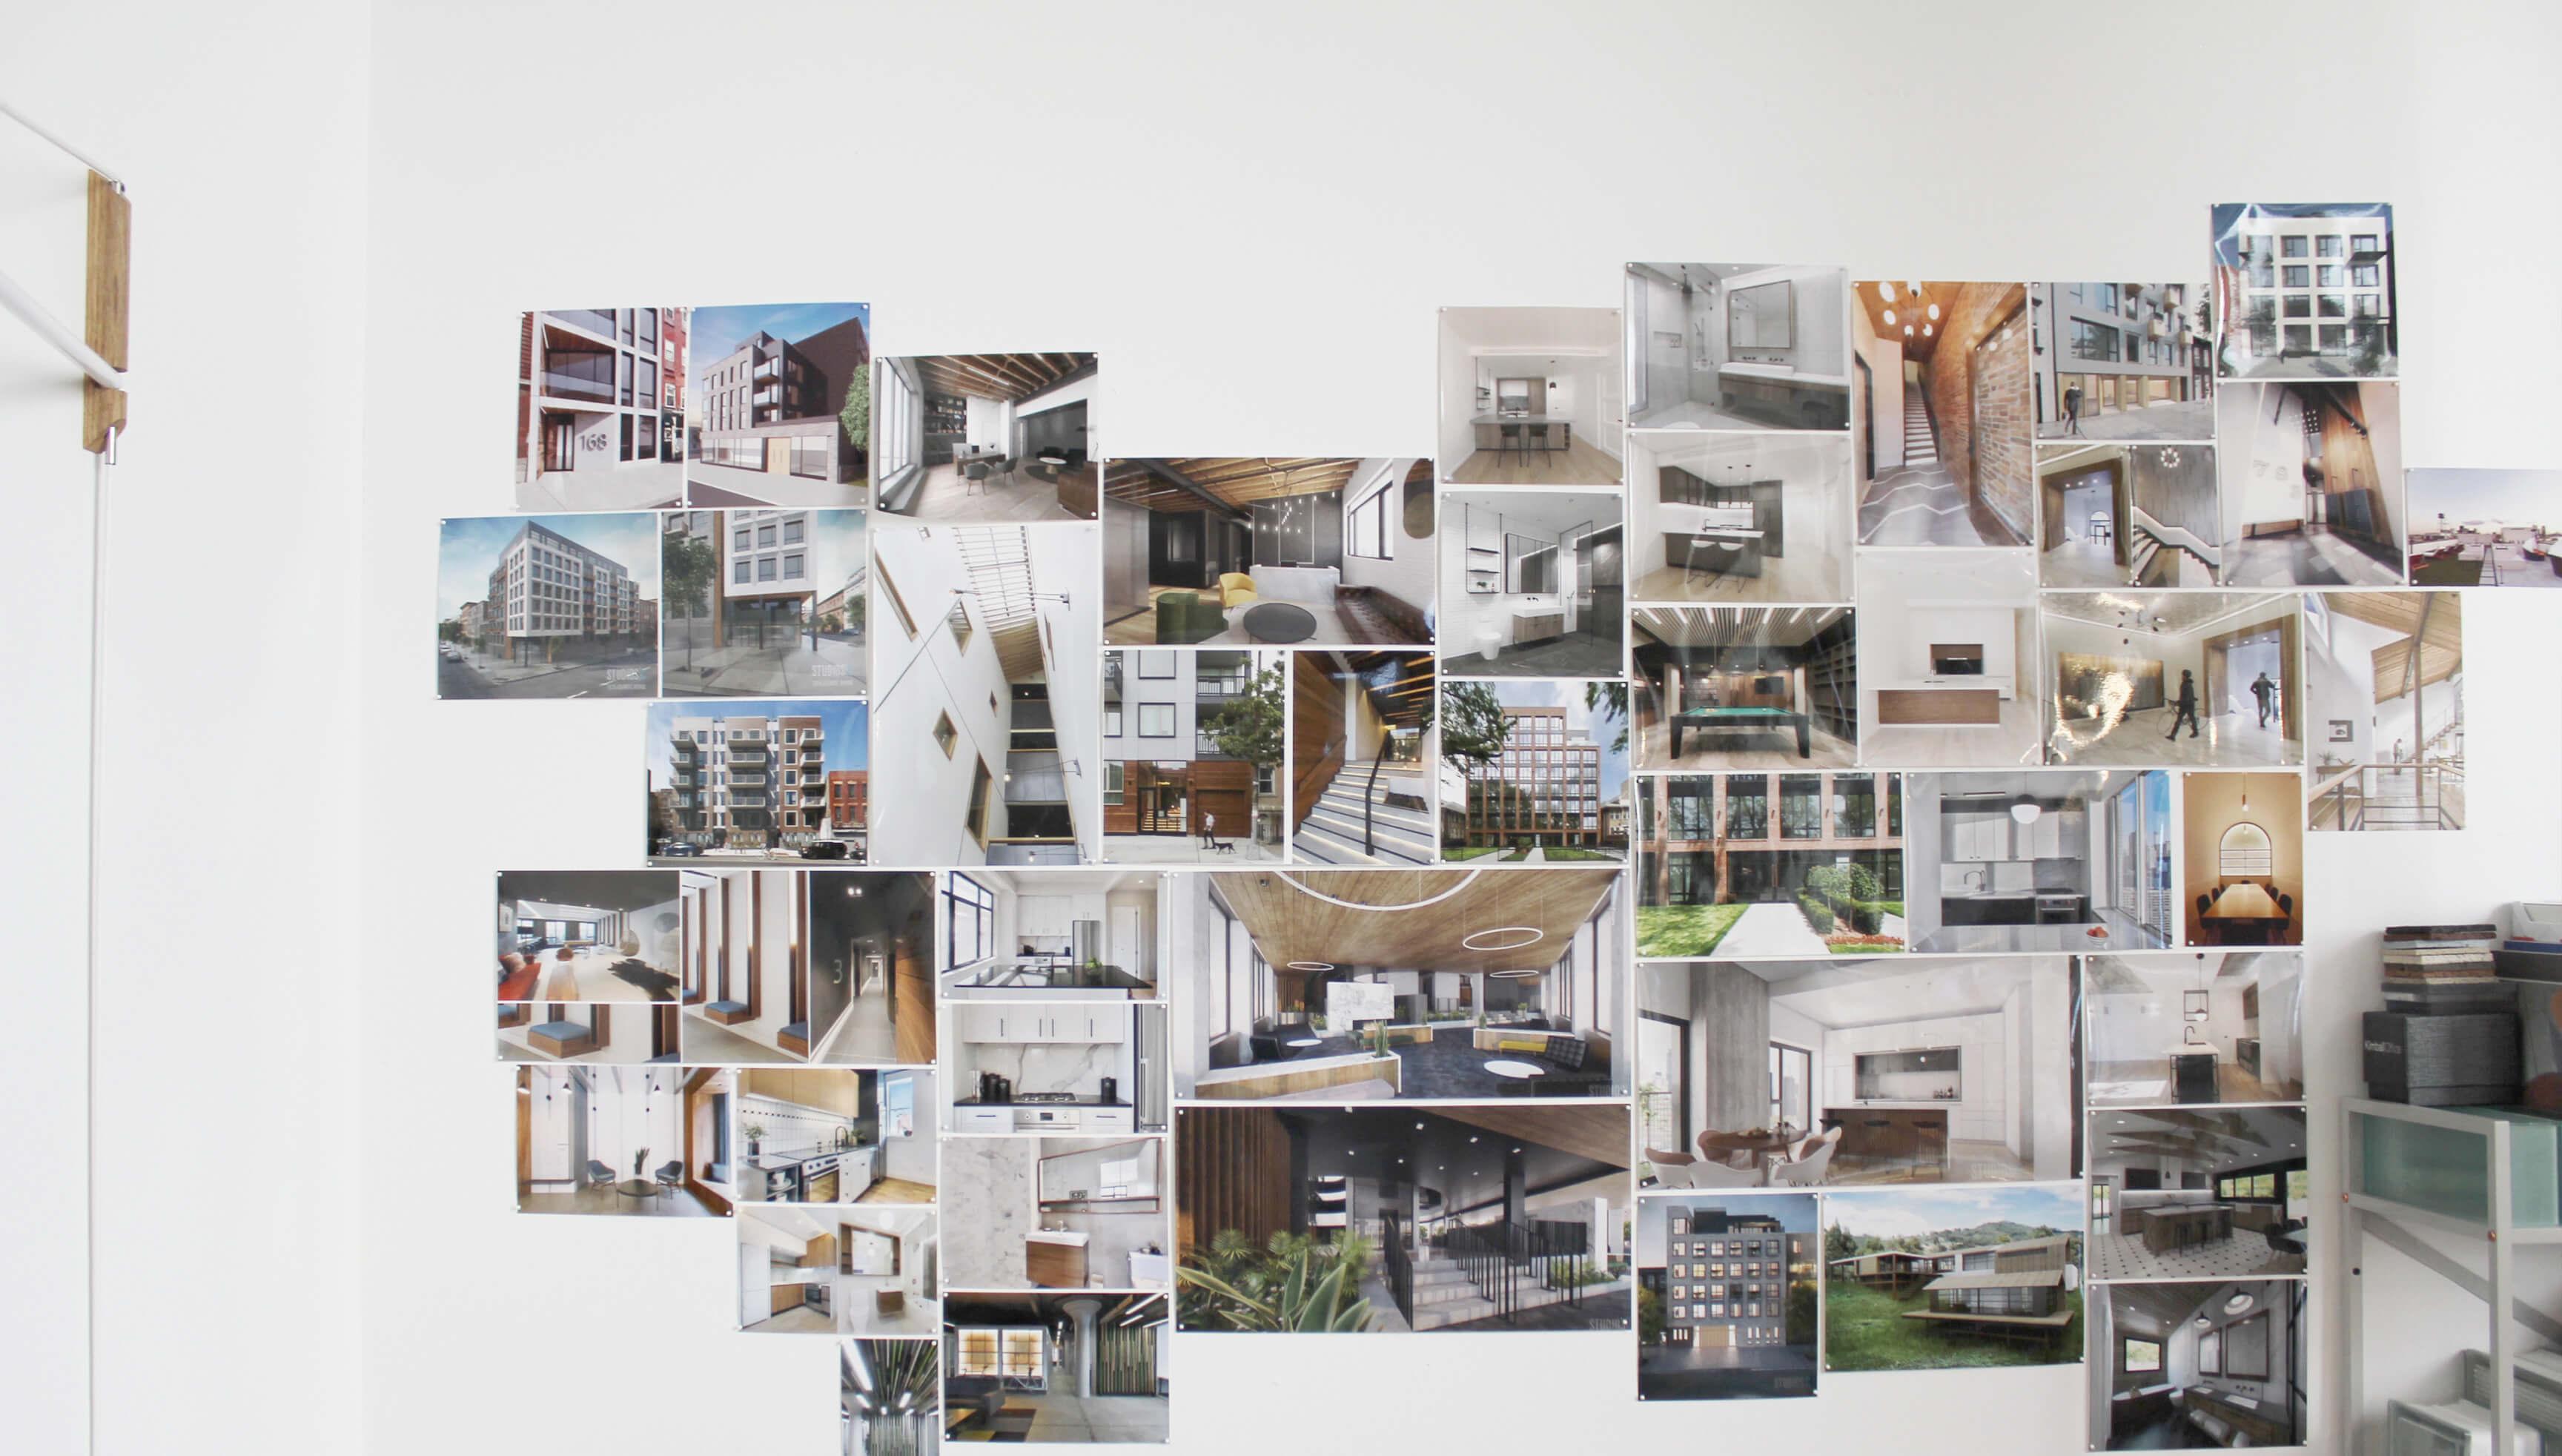 StudiosC - Architecture Studio Based in Brooklyn, New York